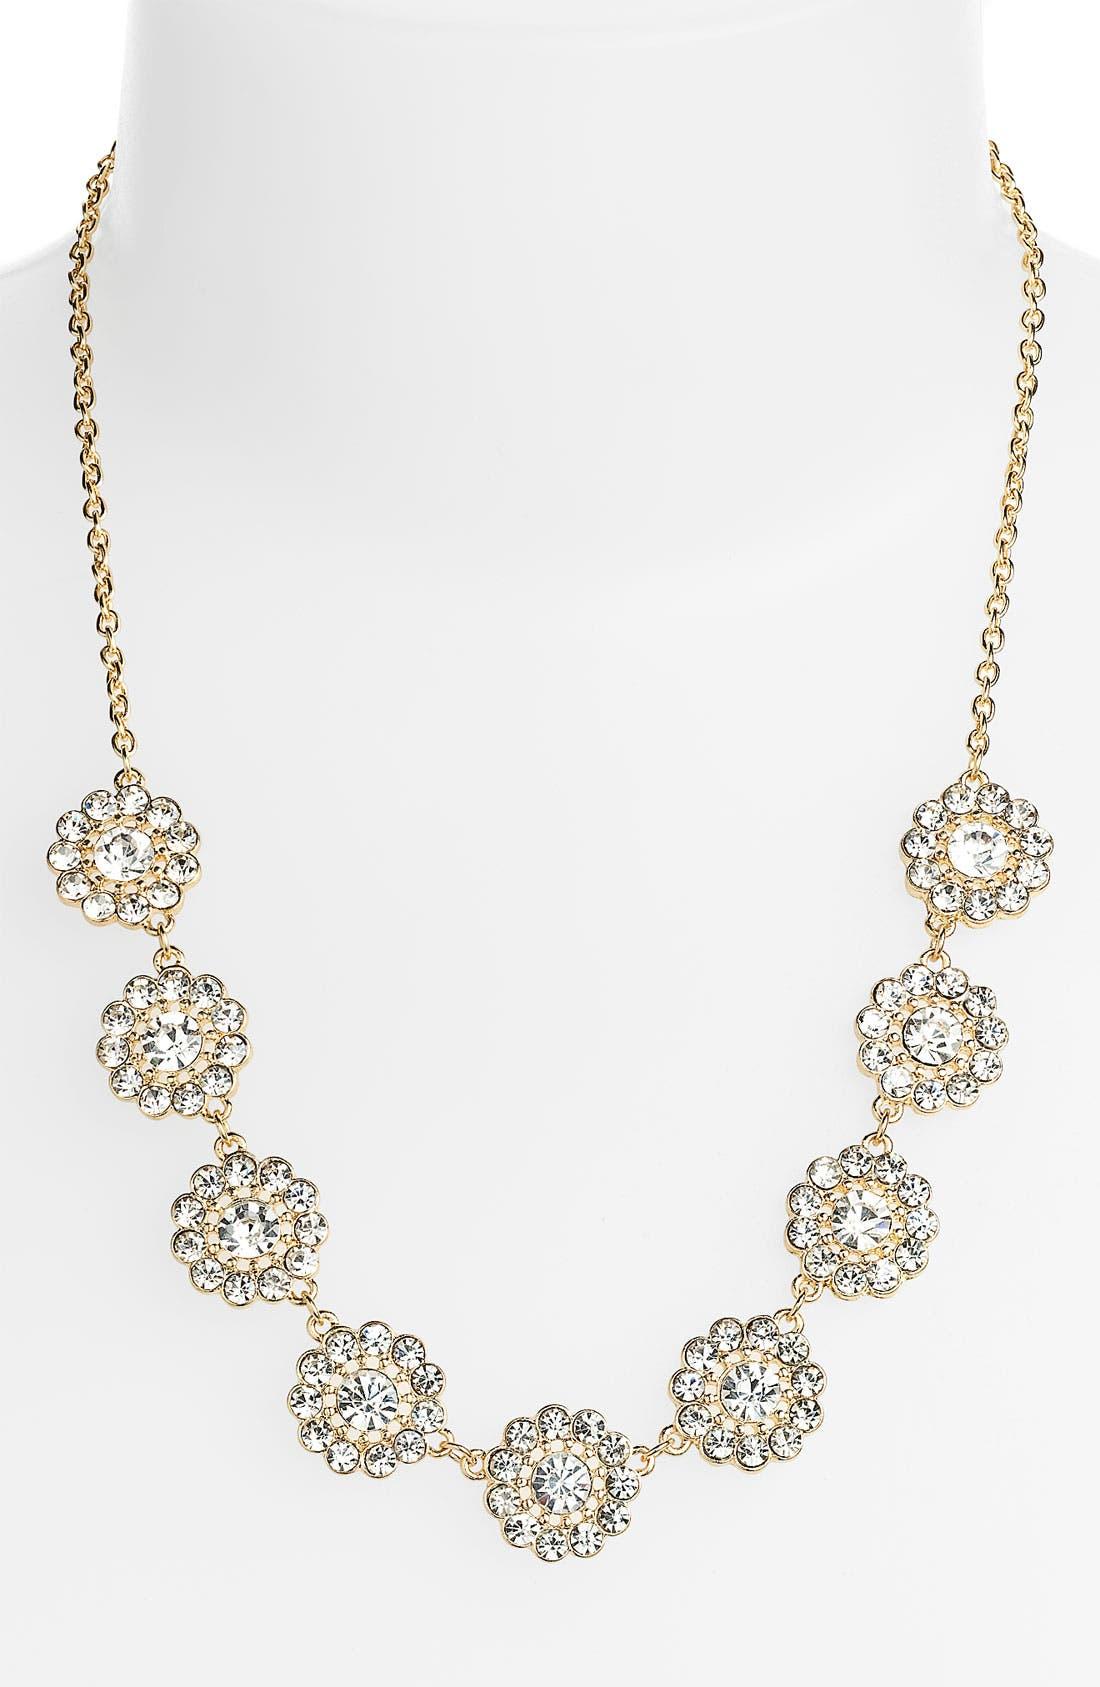 Alternate Image 1 Selected - Carole Floral Rhinestone Necklace